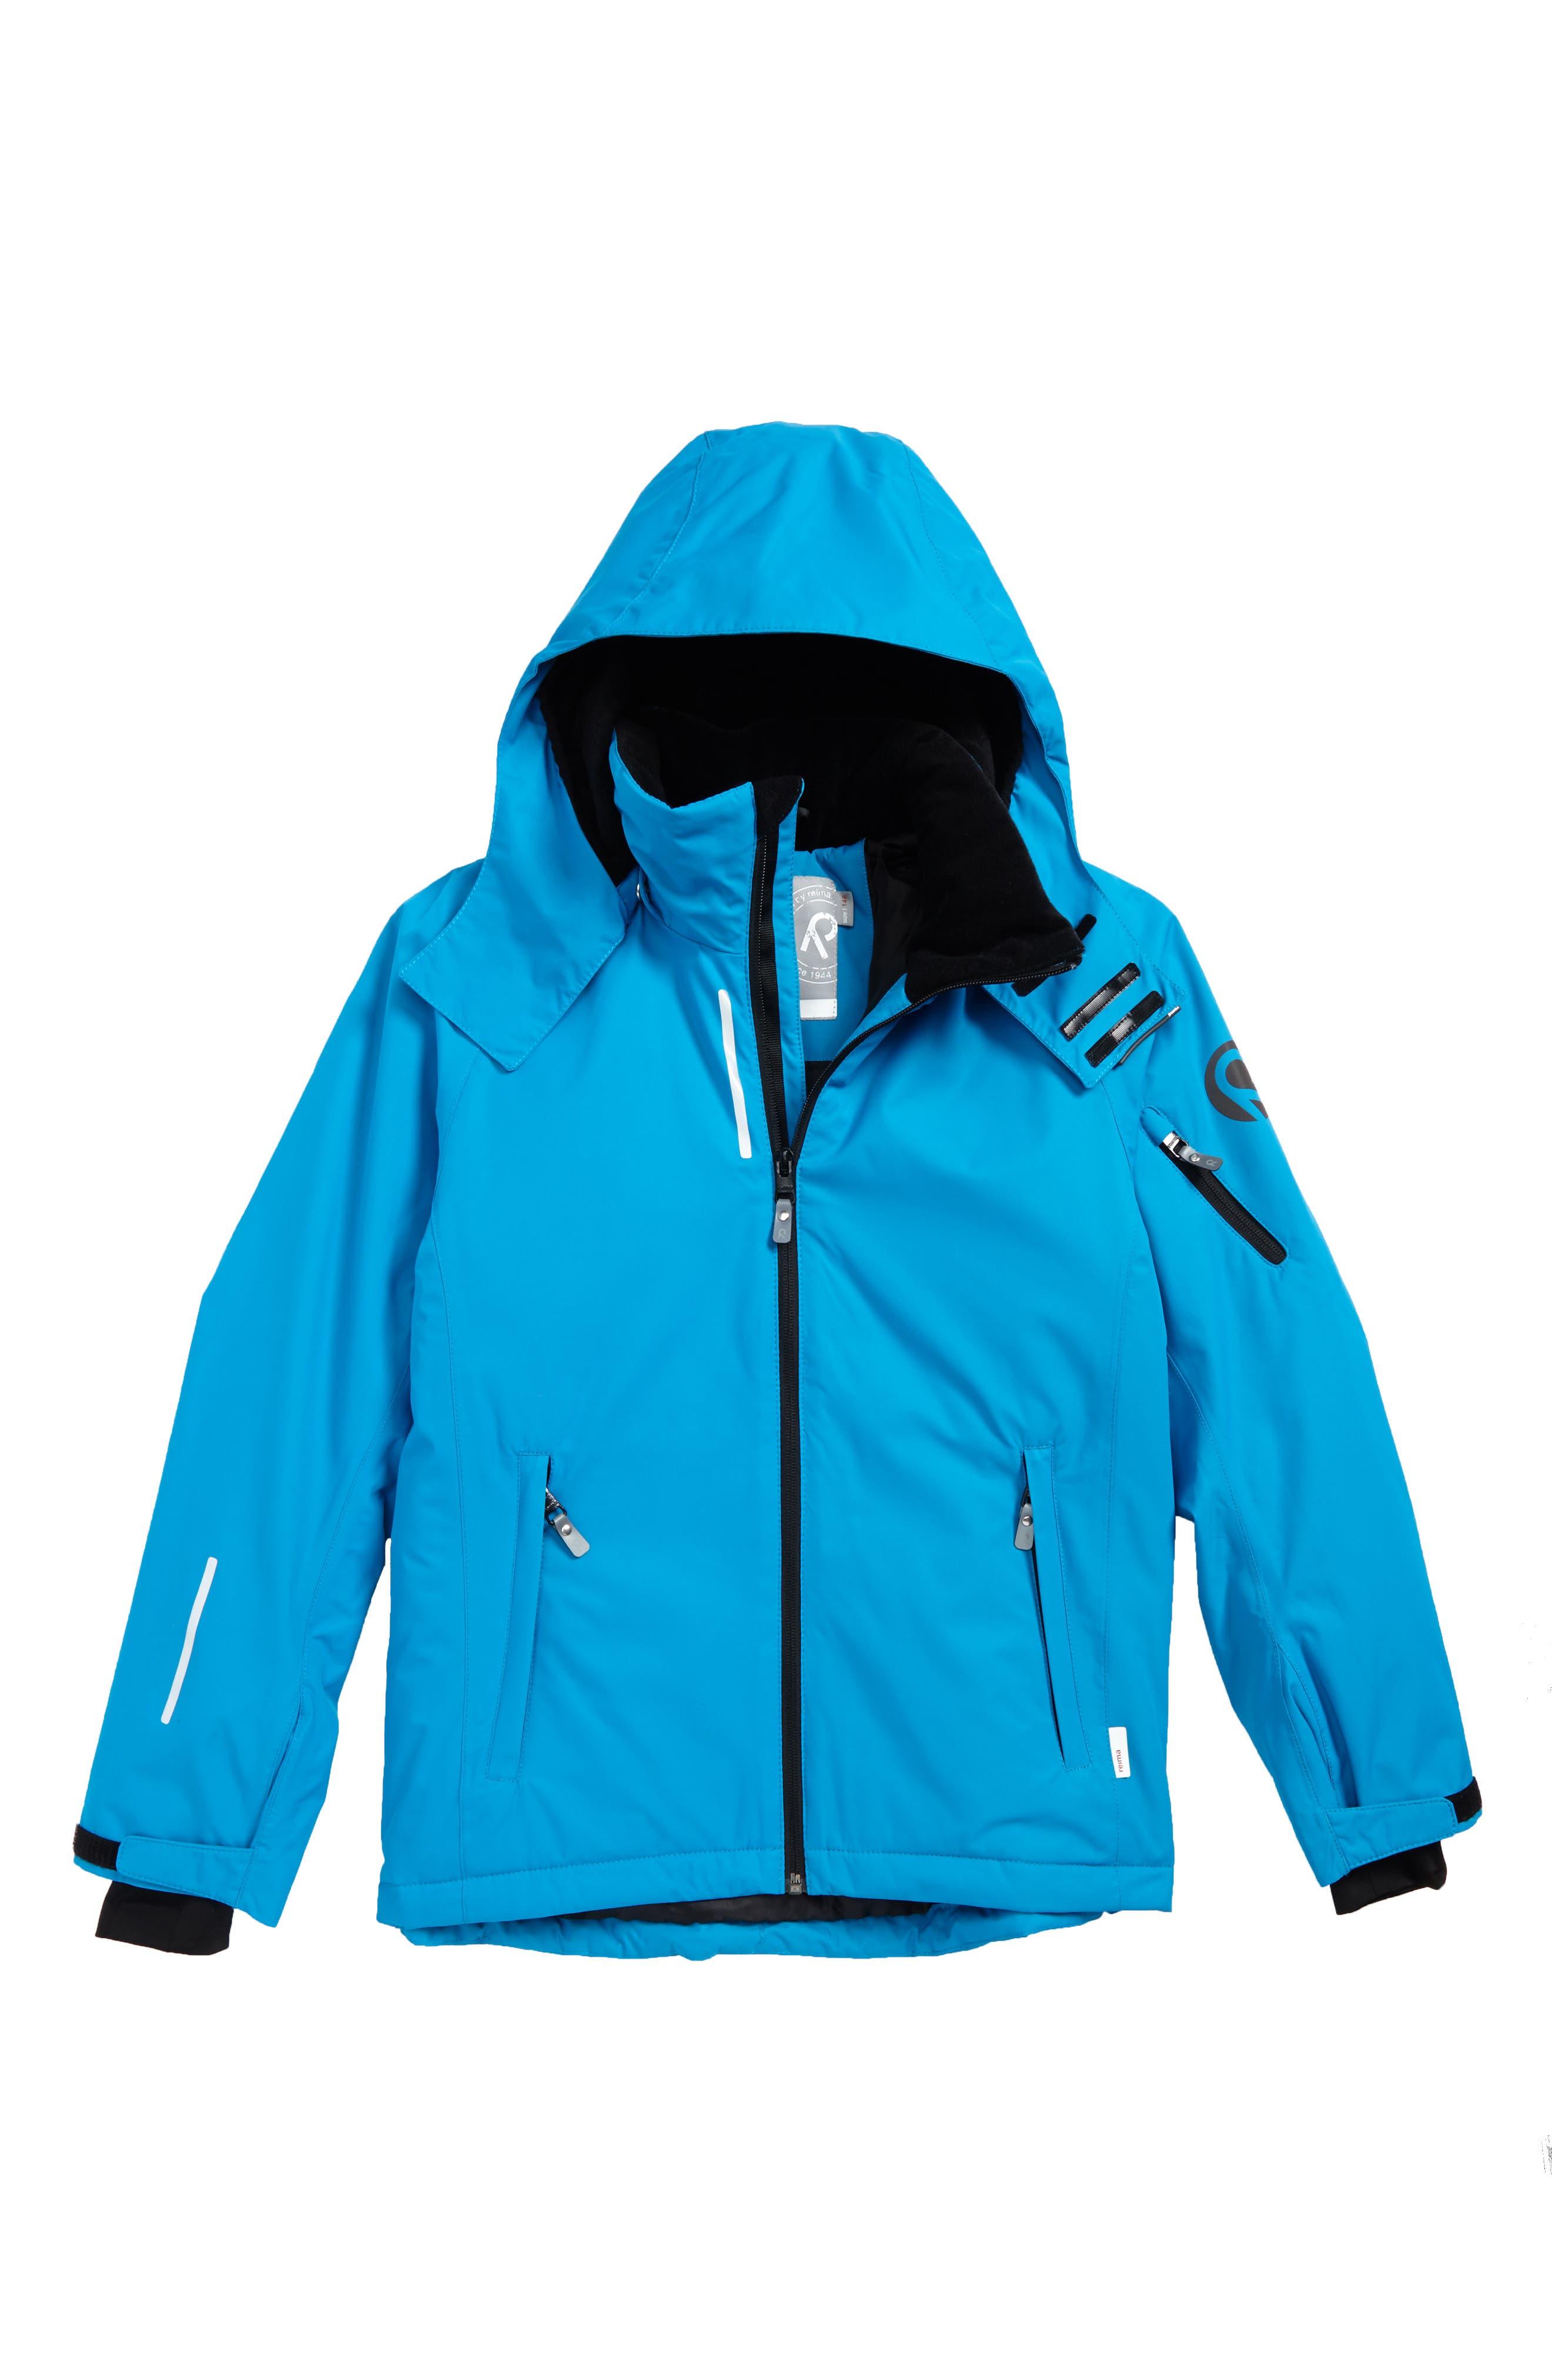 Reimatec<sup>®</sup> Detour Waterproof Hooded Jacket,                             Main thumbnail 1, color,